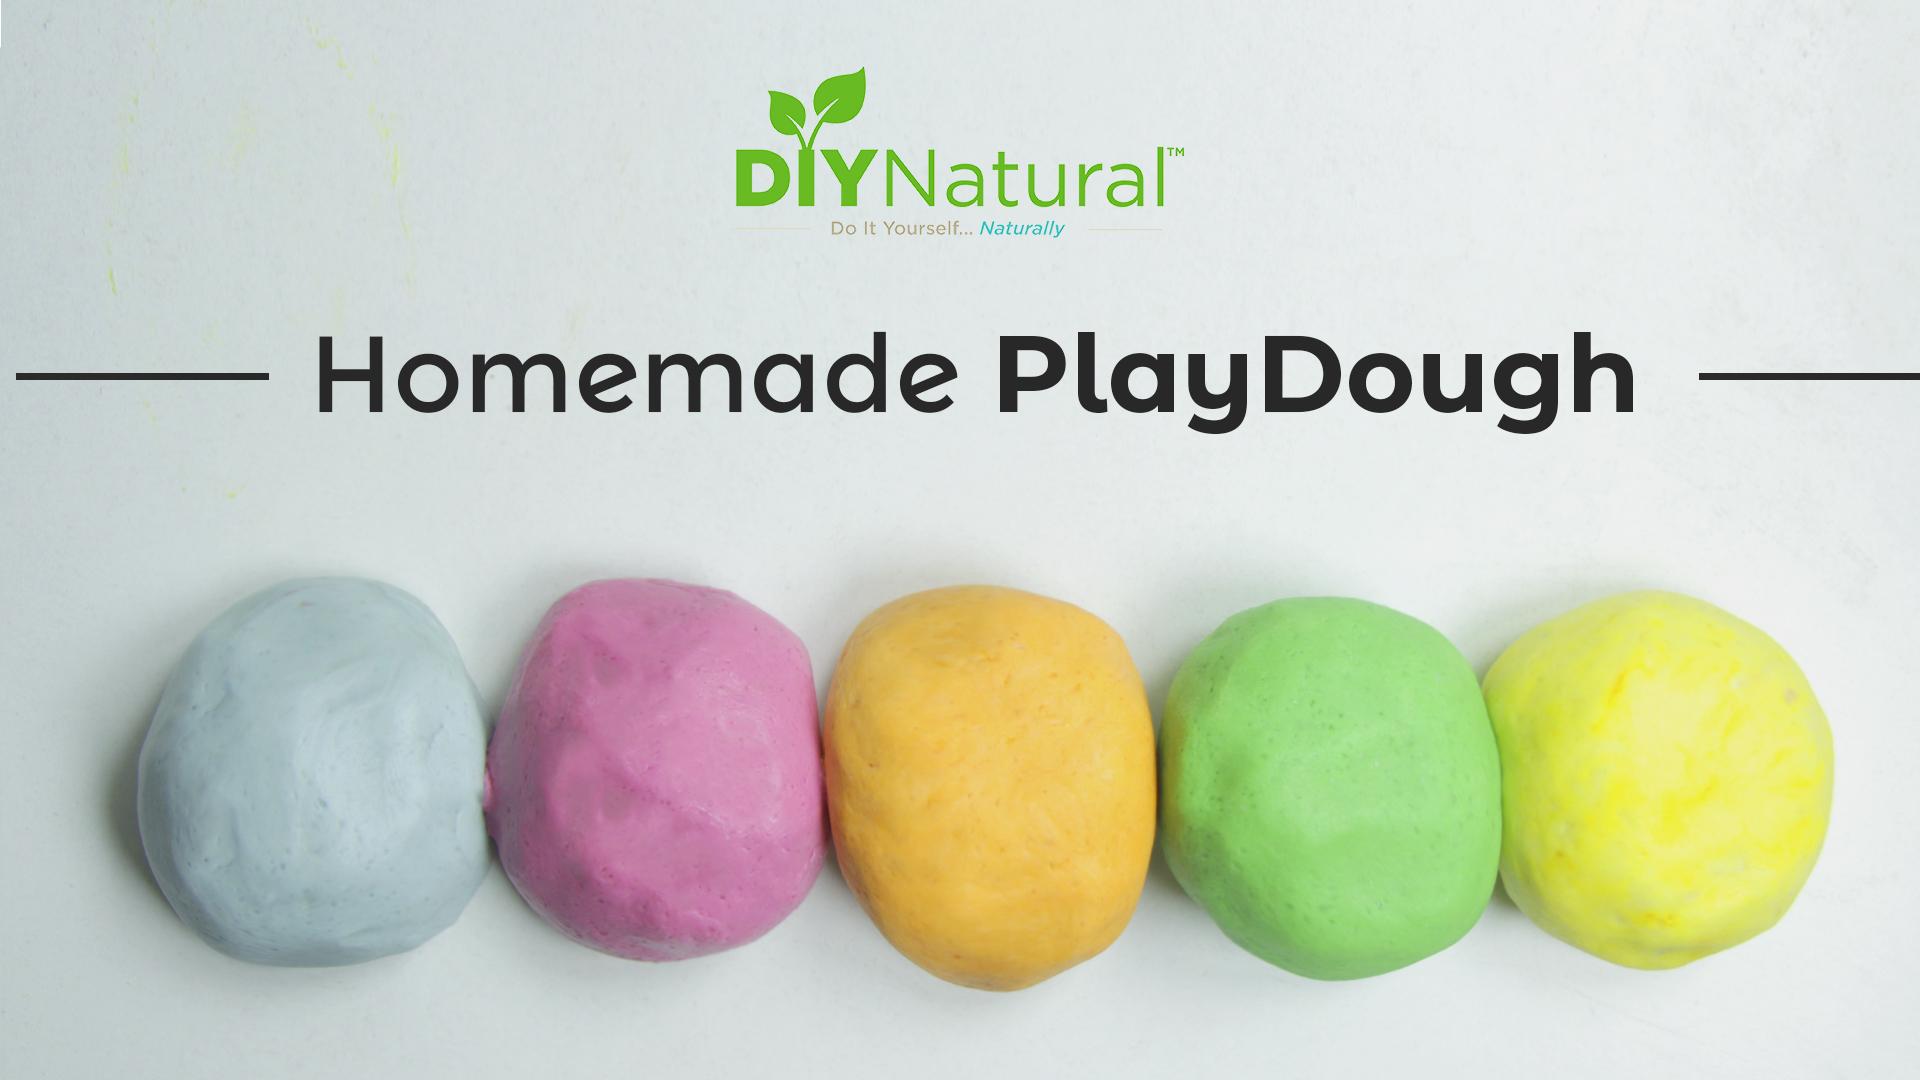 Homemade PlayDough: A Simple and Natural Recipe  DIY Natural